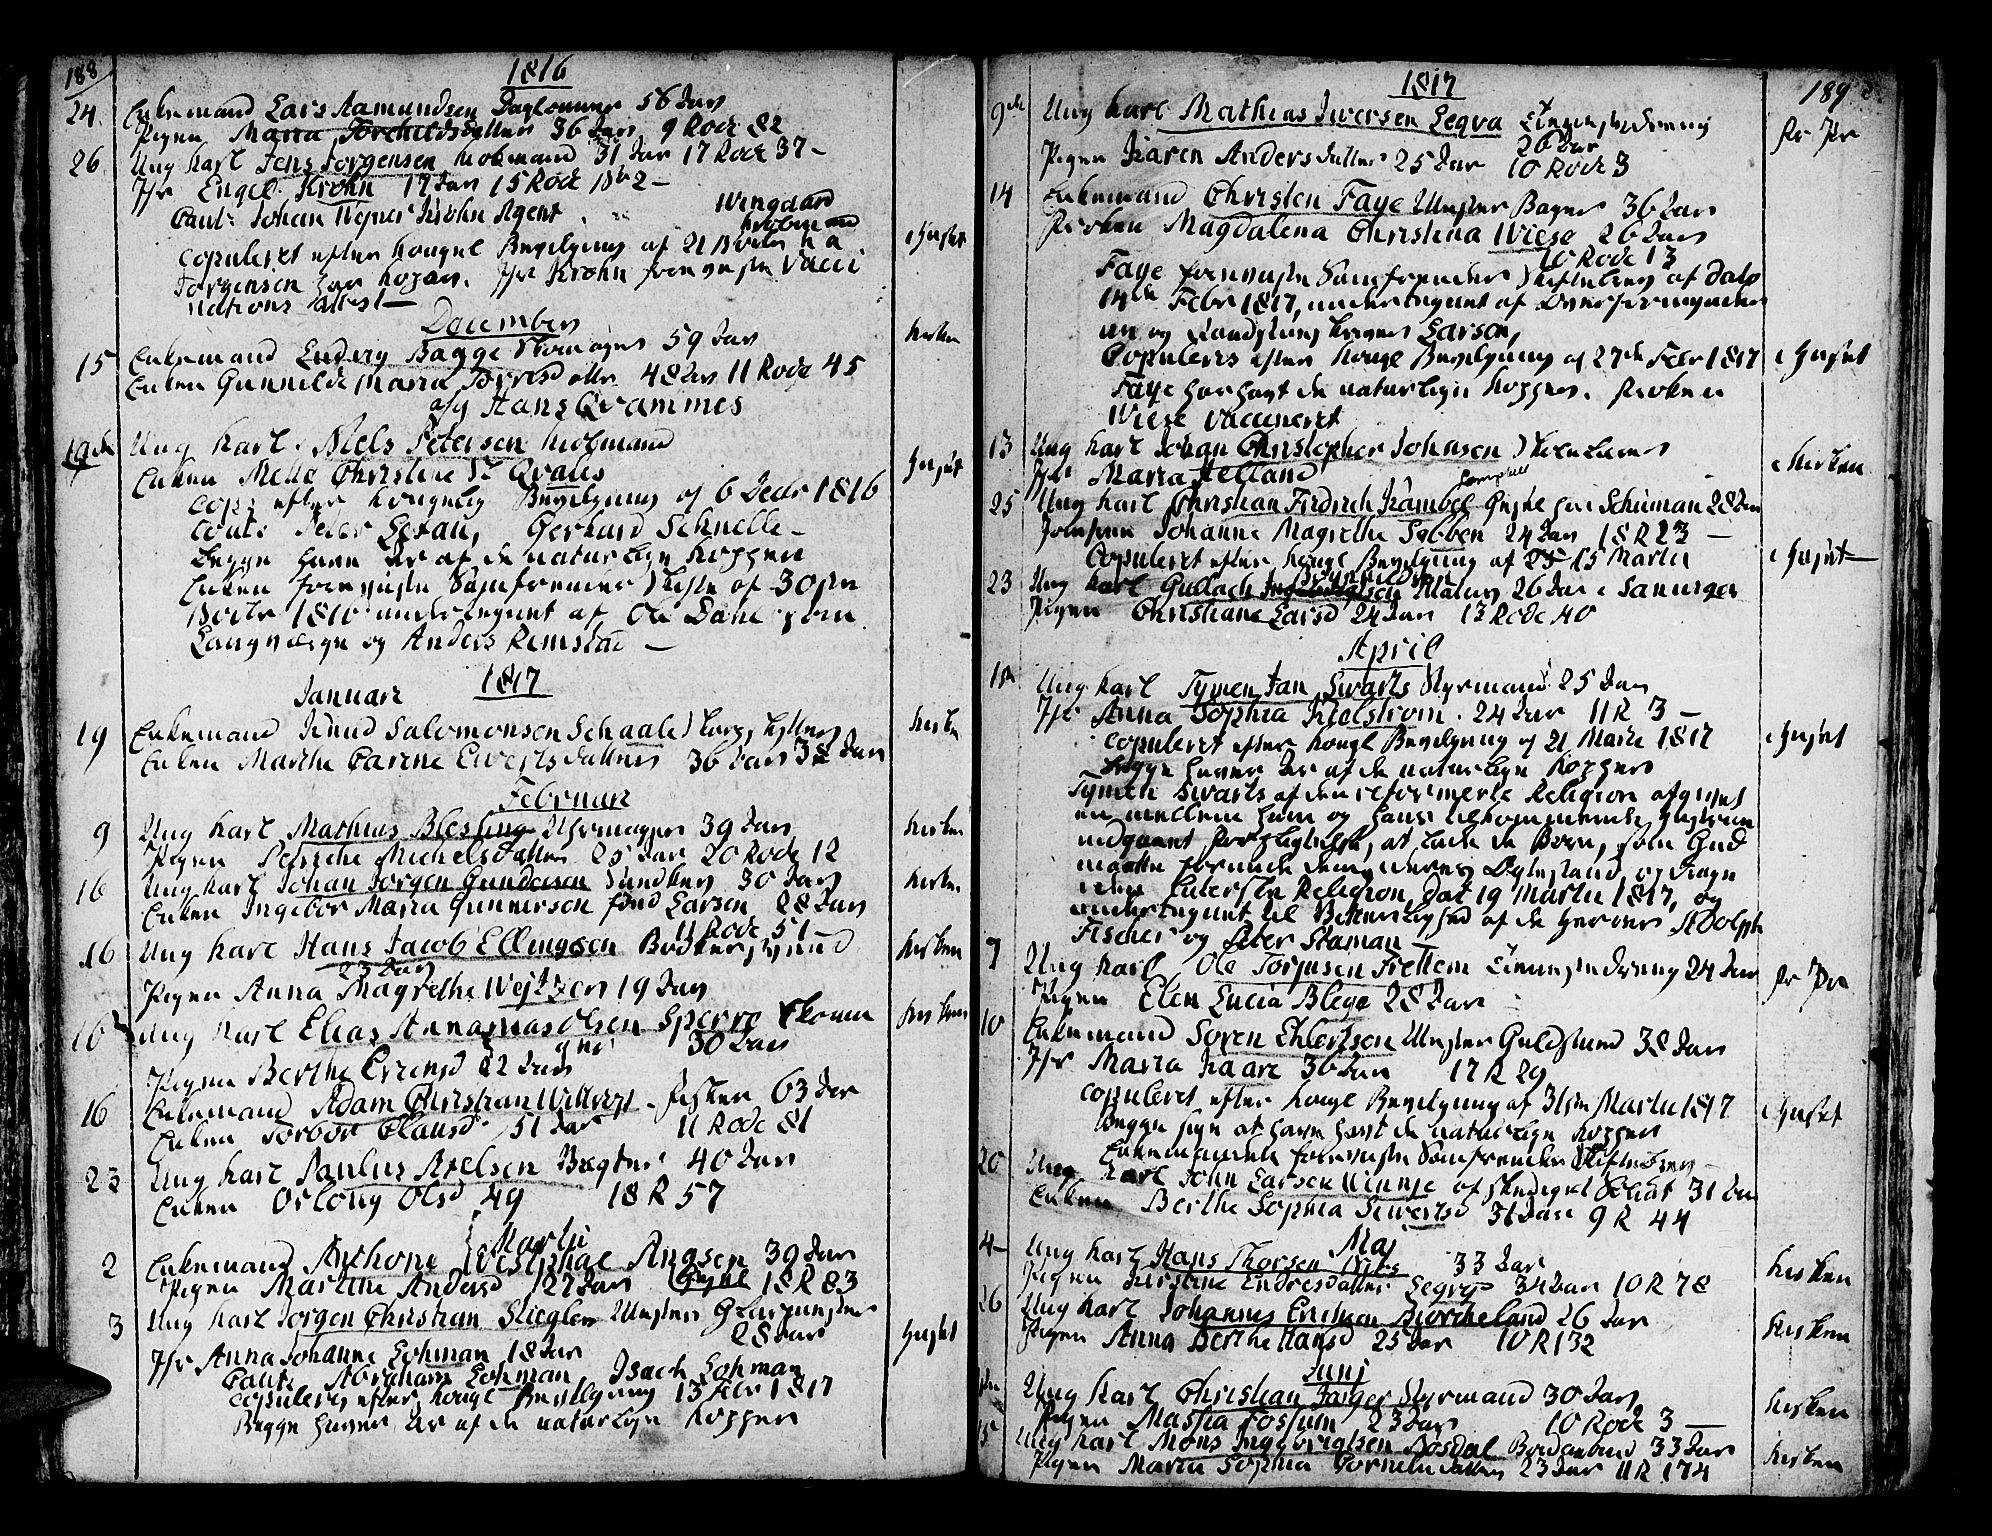 SAB, Domkirken Sokneprestembete, H/Haa/L0007: Ministerialbok nr. A 7, 1725-1826, s. 188-189